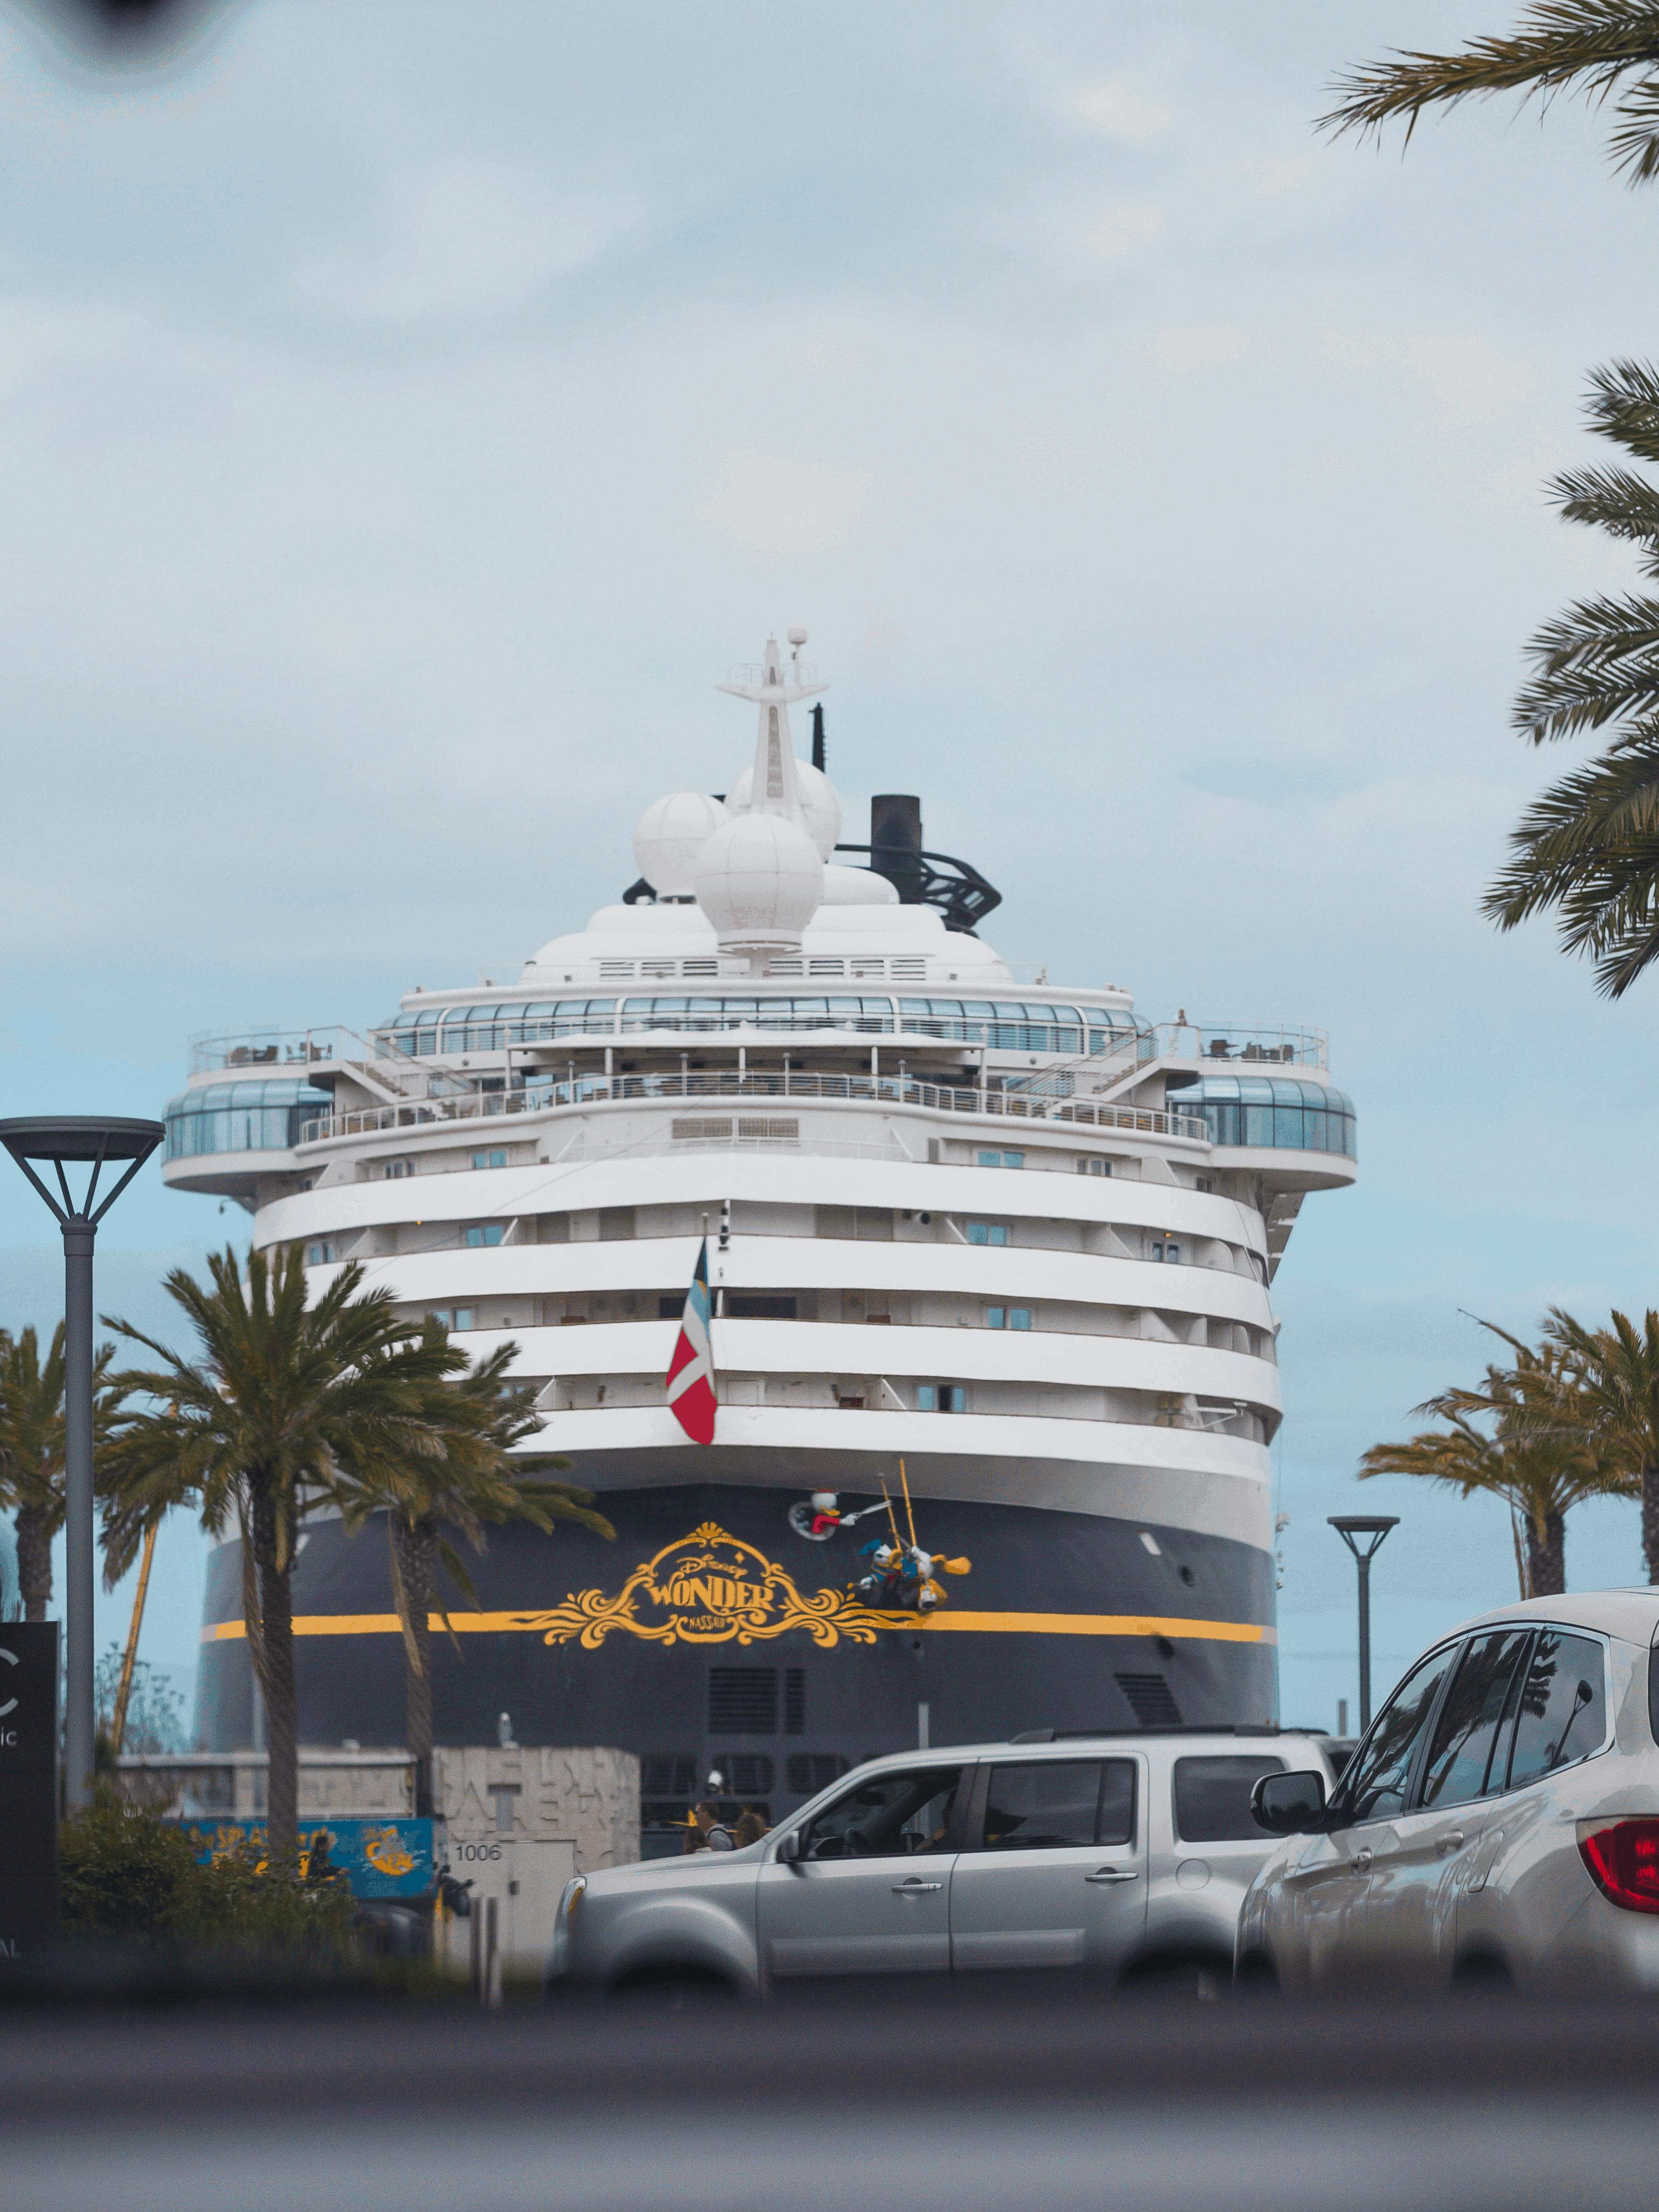 San Diego Disney Cruise